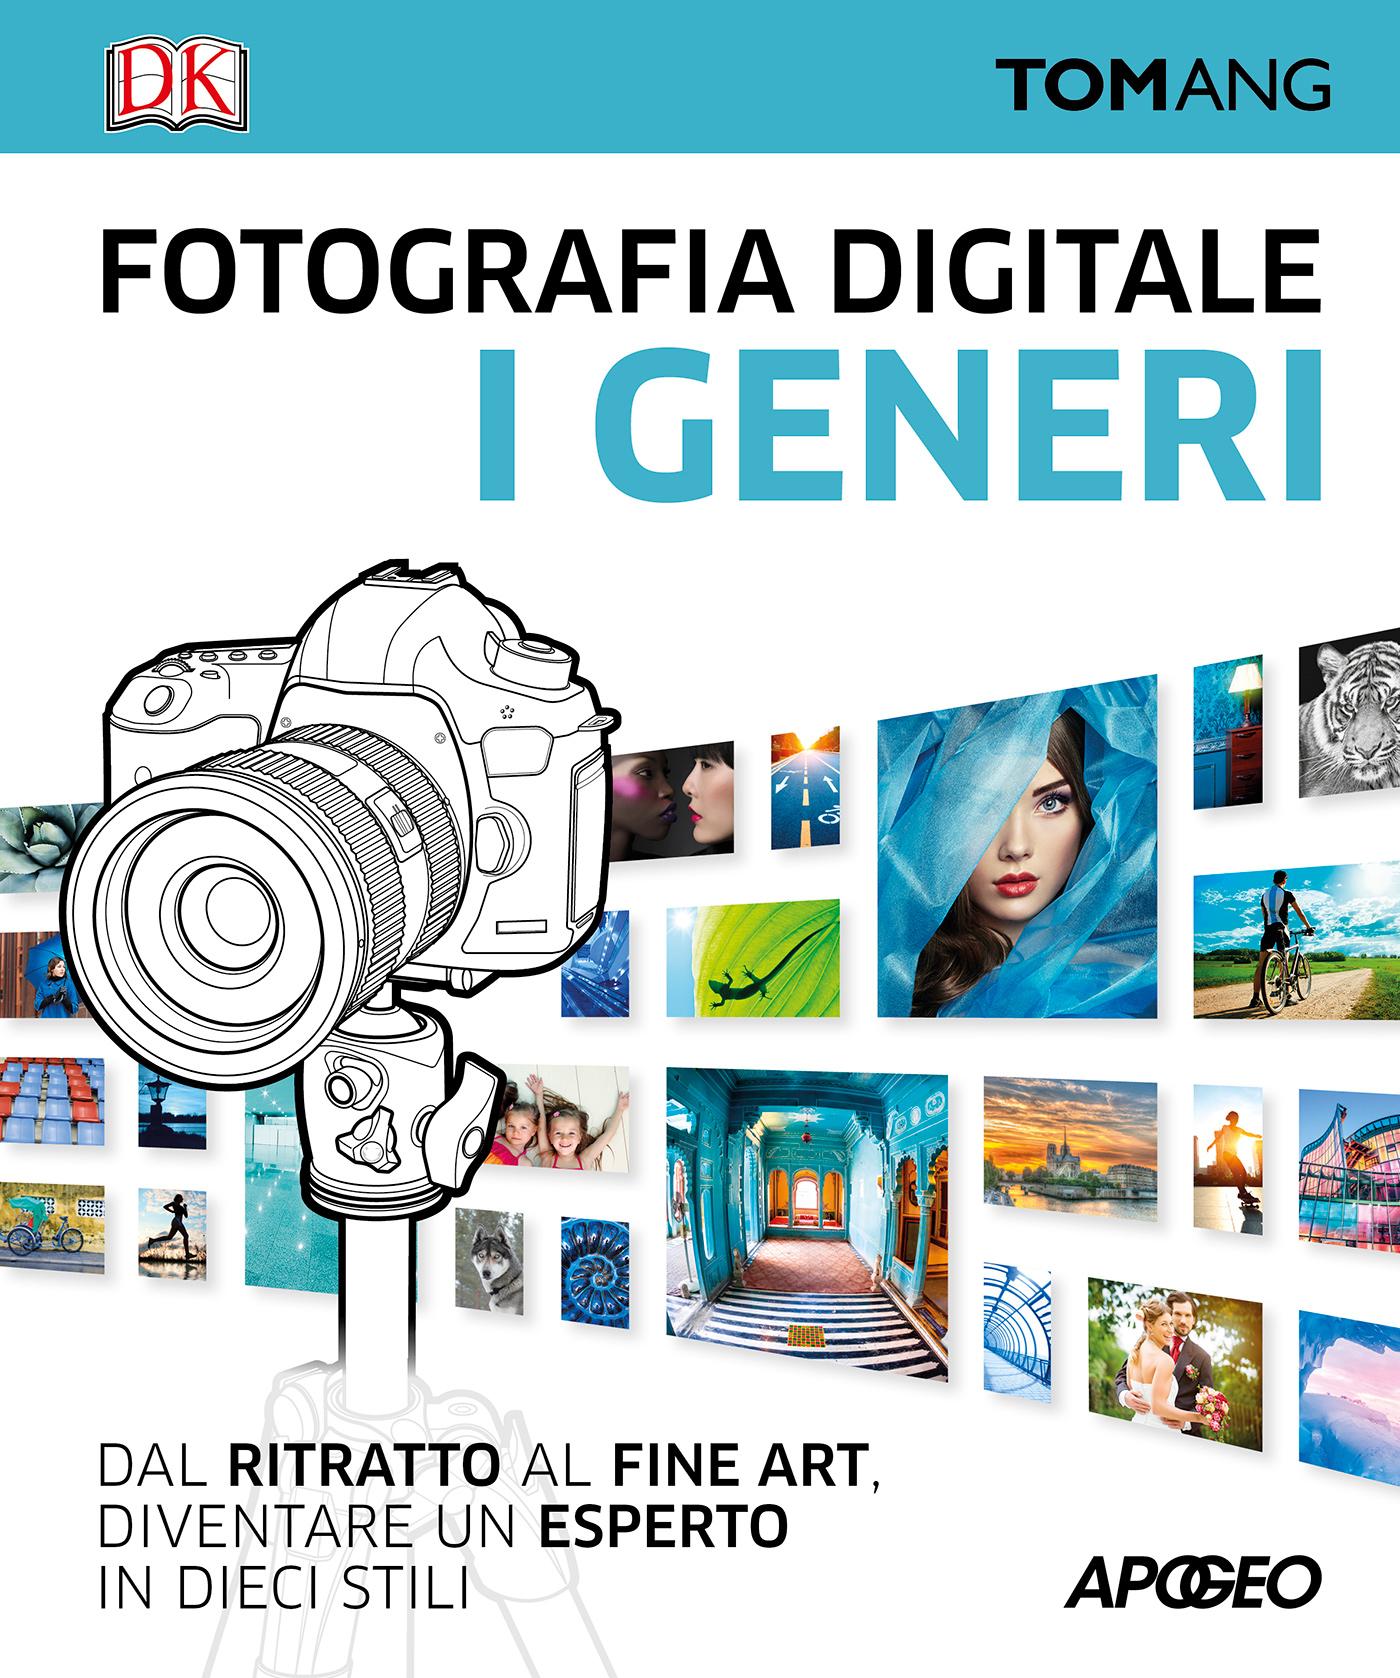 Fotografia digitale i generi